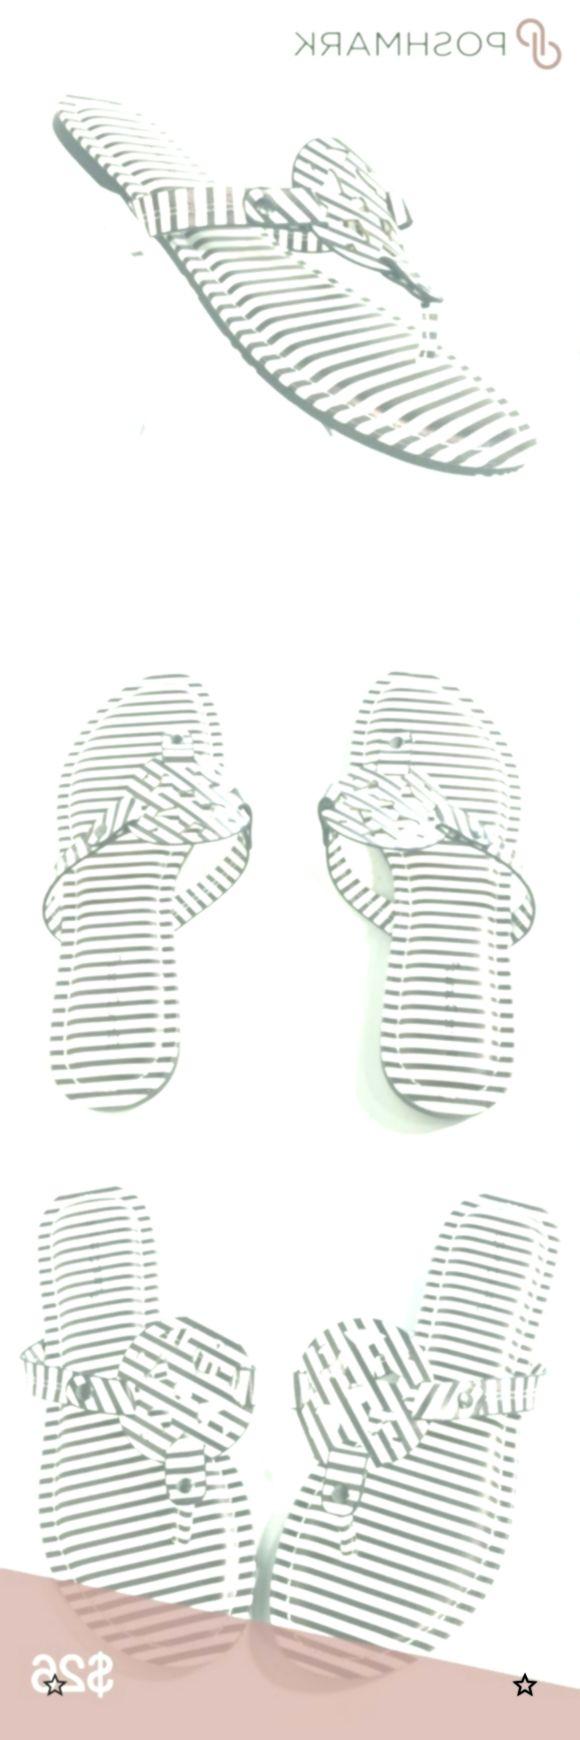 Pierre Dumas Black White Flip Flops Sandals Shoes Black and White Stripes Flip F